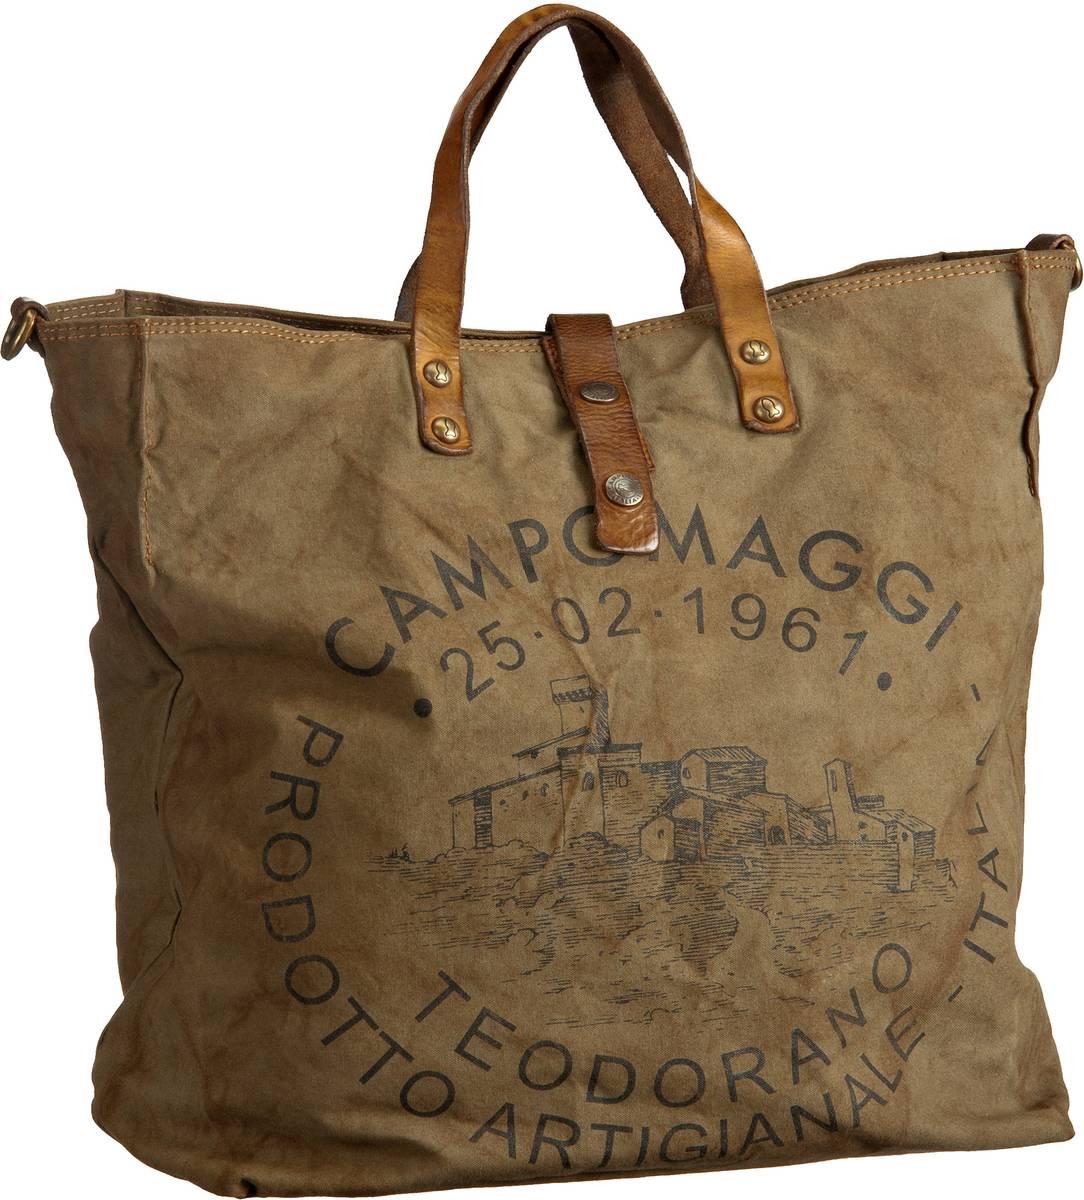 Campomaggi Sesia Canvas Bag Militare/Stampa Nera - Handtasche Sale Angebote Gastrose-Kerkwitz